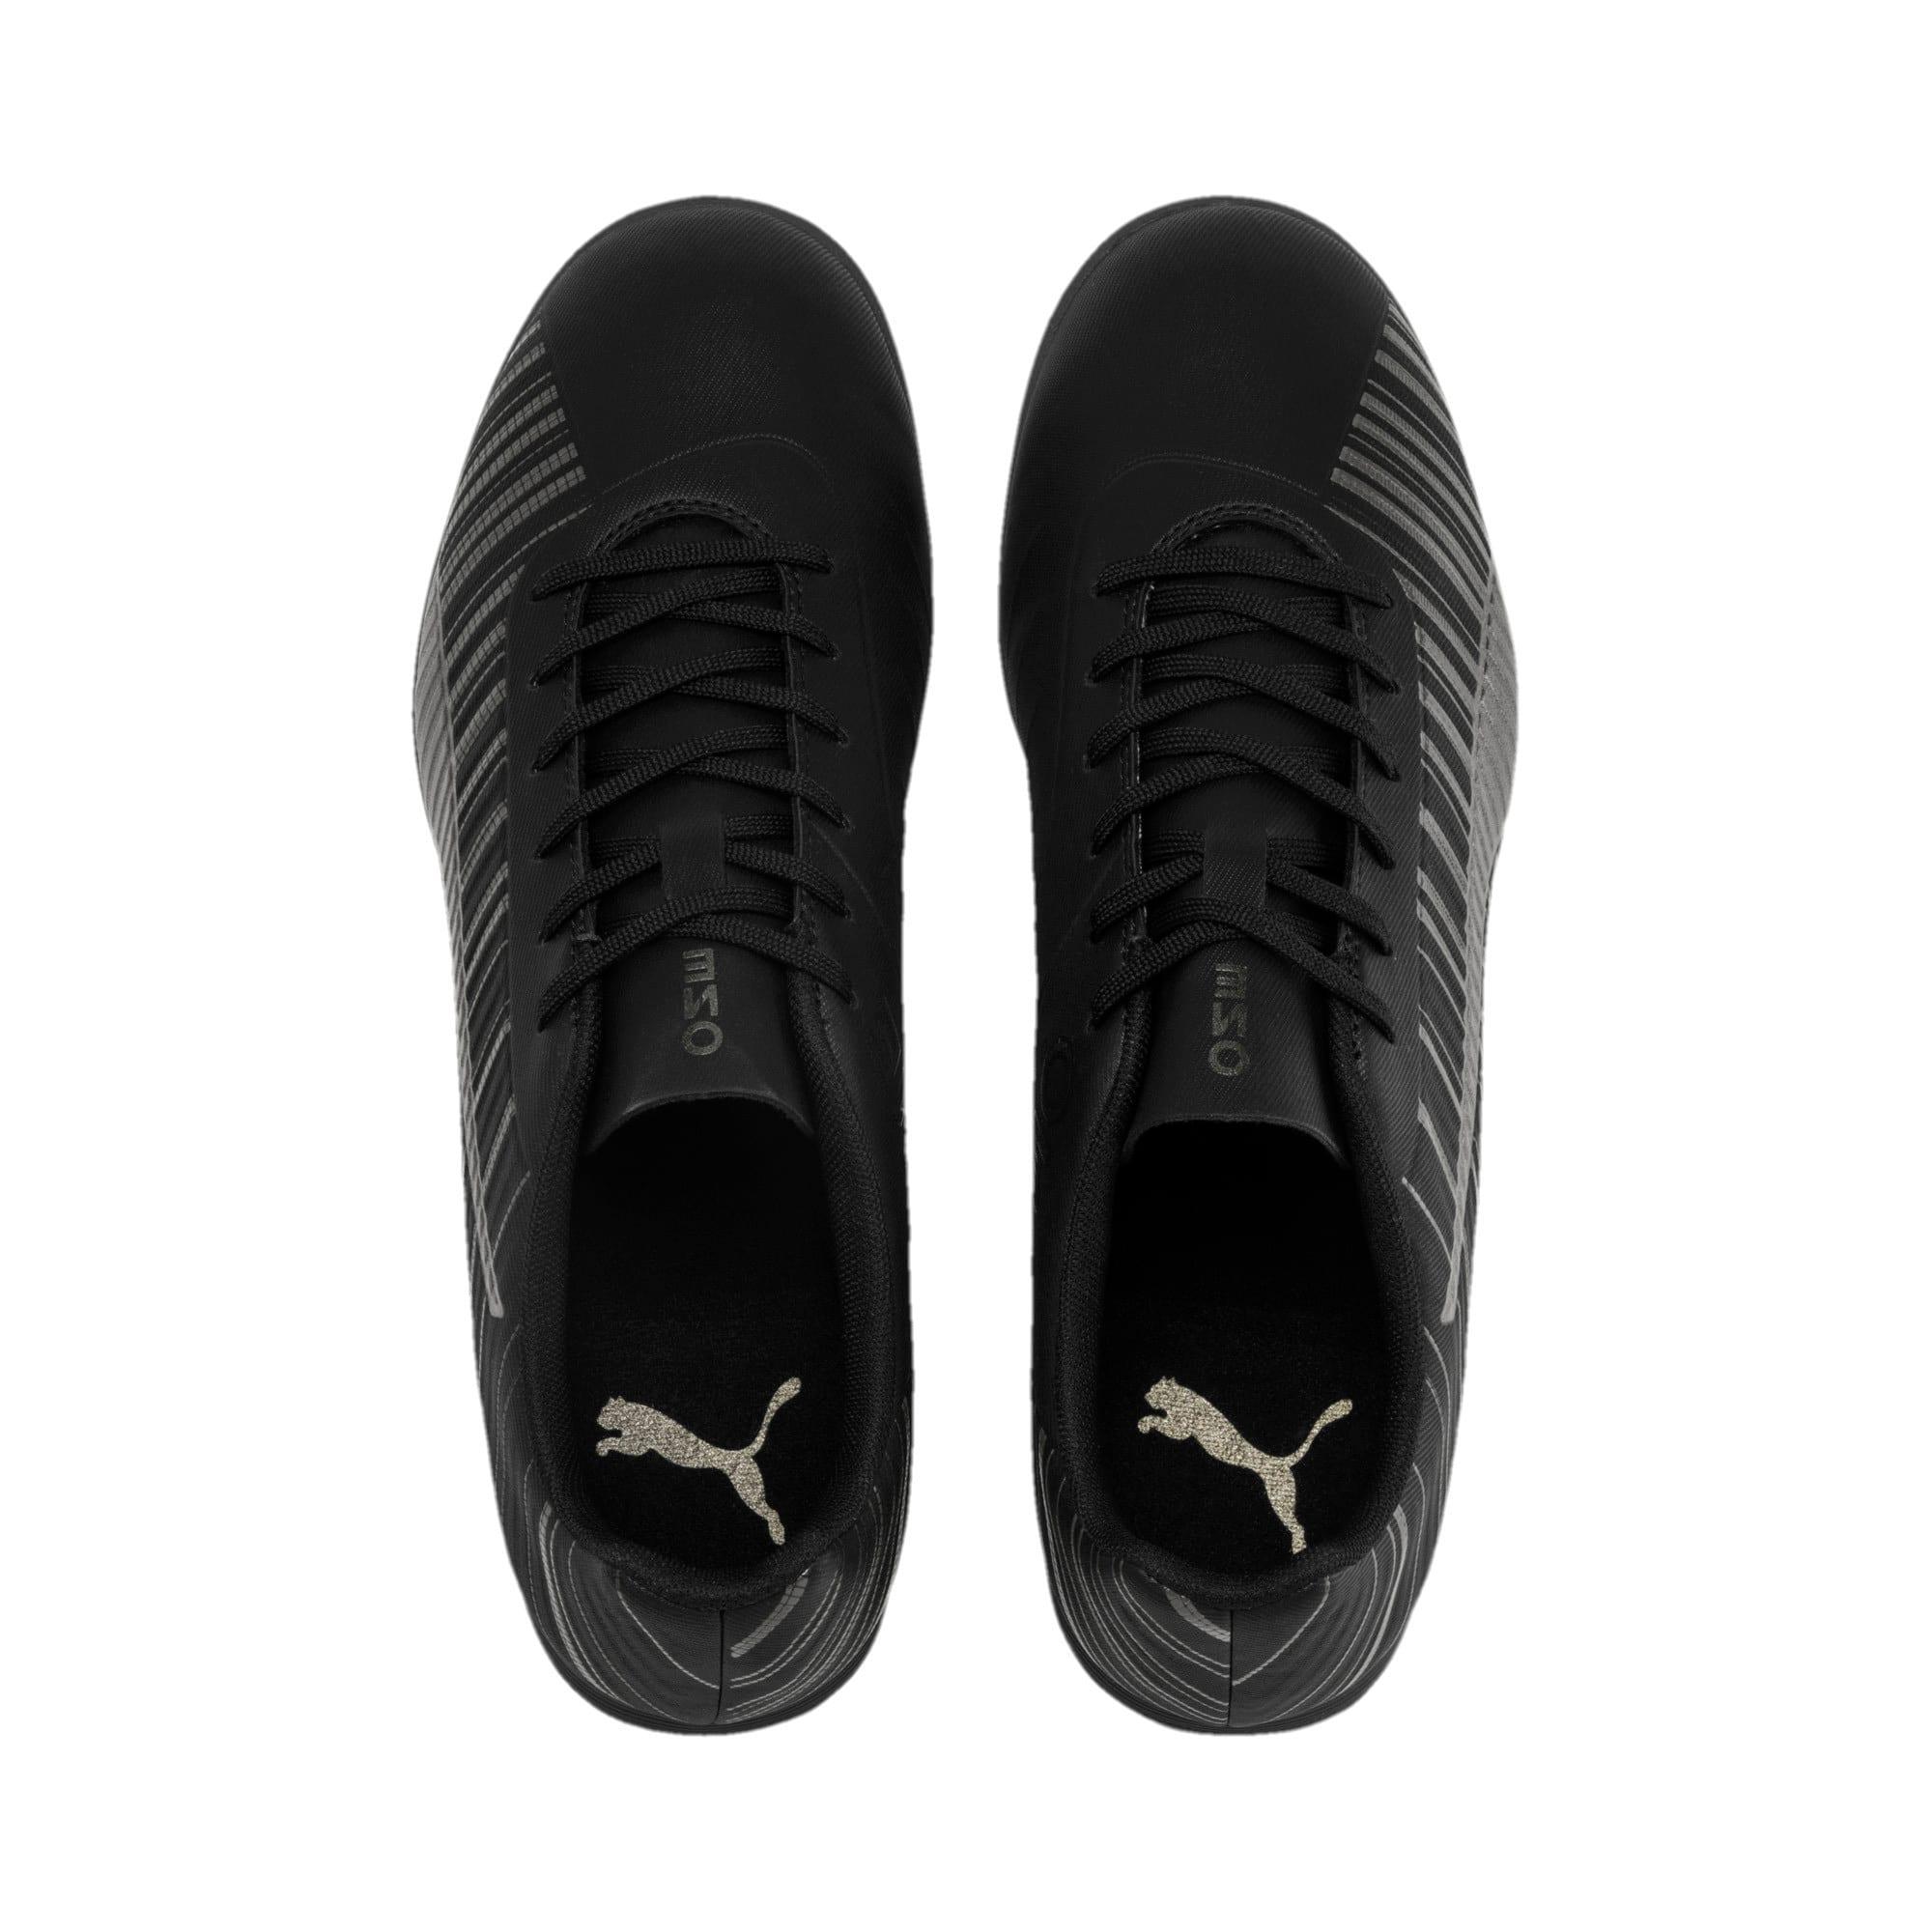 Thumbnail 7 of PUMA ONE 5.4 TT Men's Football Boots, Black-Black-Puma Aged Silver, medium